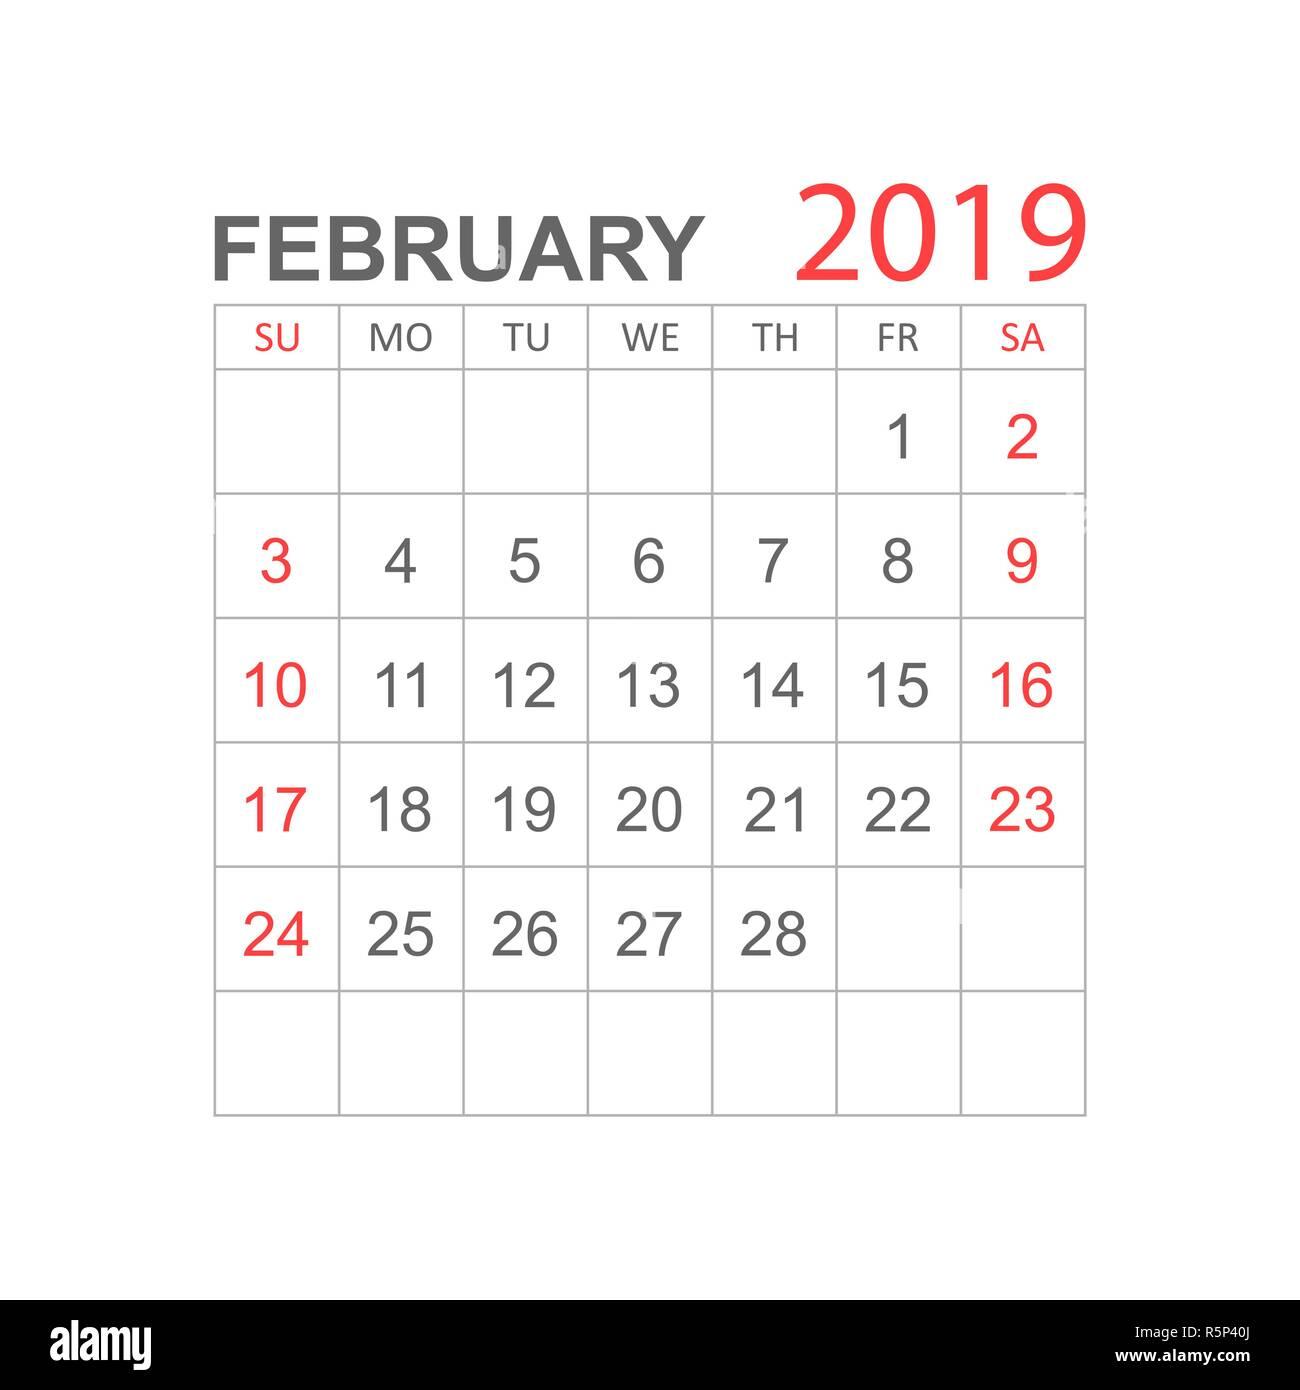 February 2019 Calendar Agenda Calendar february 2019 year in simple style. Calendar planner